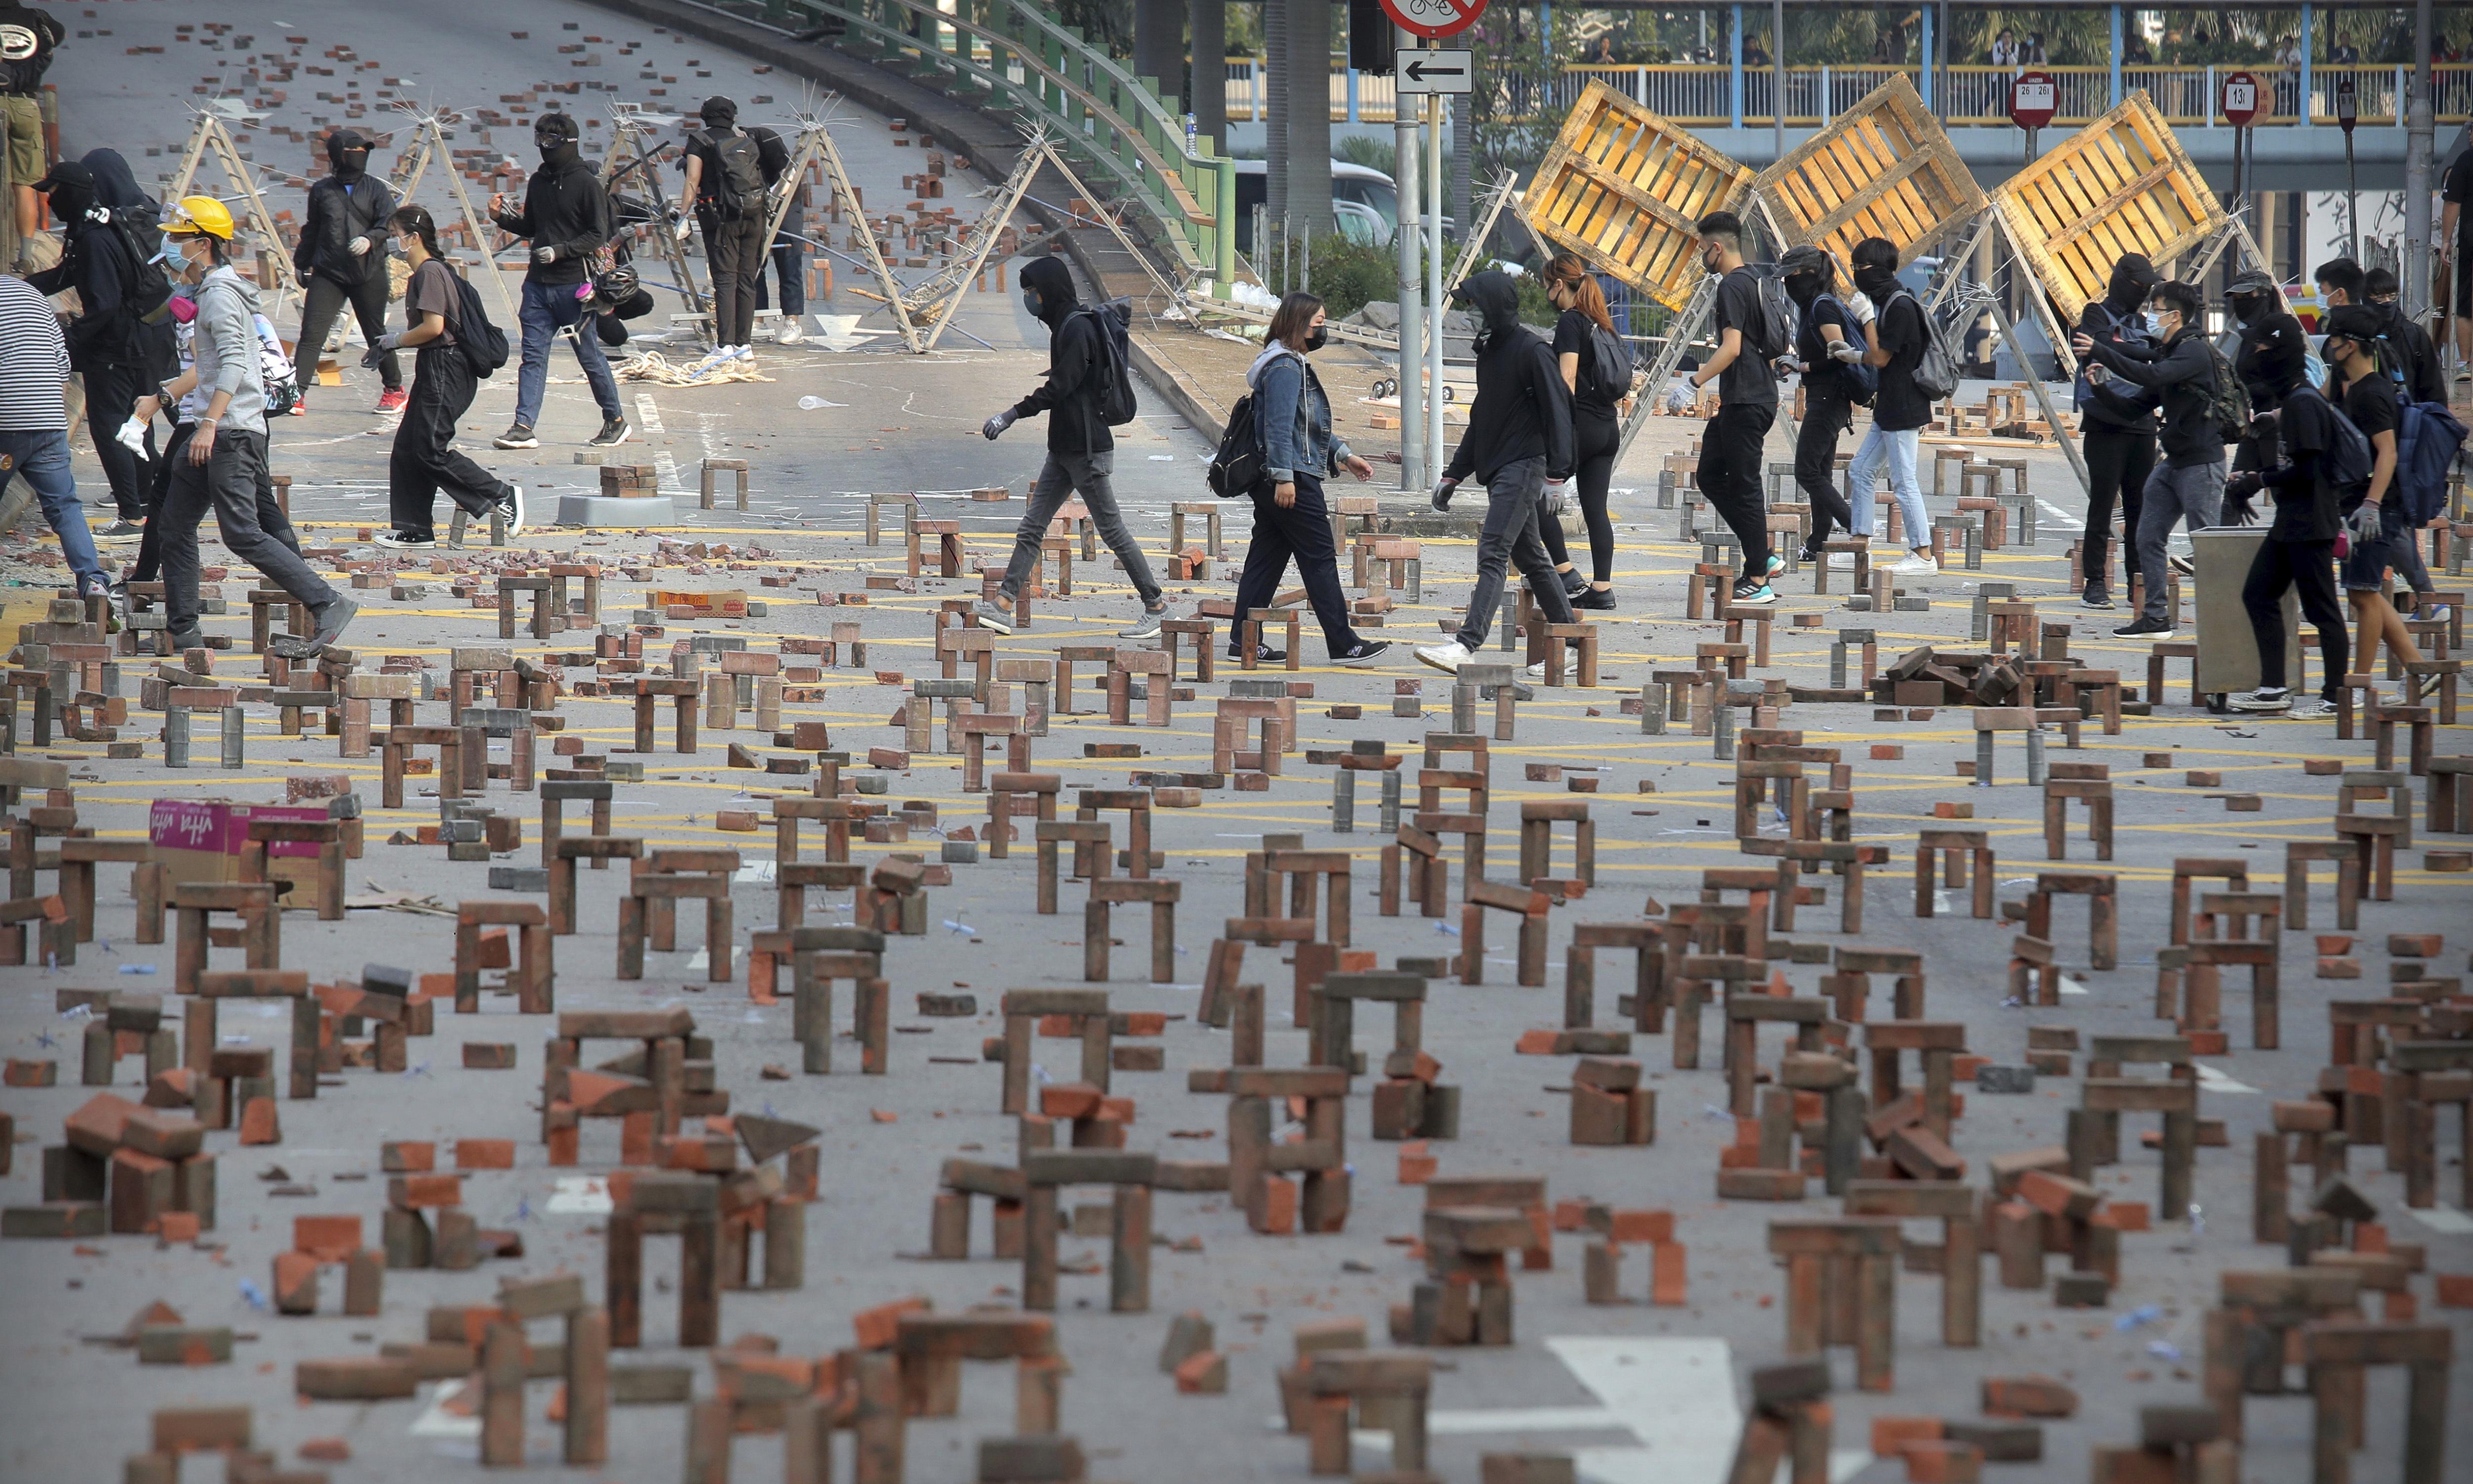 Sydney university students urged to leave Hong Kong